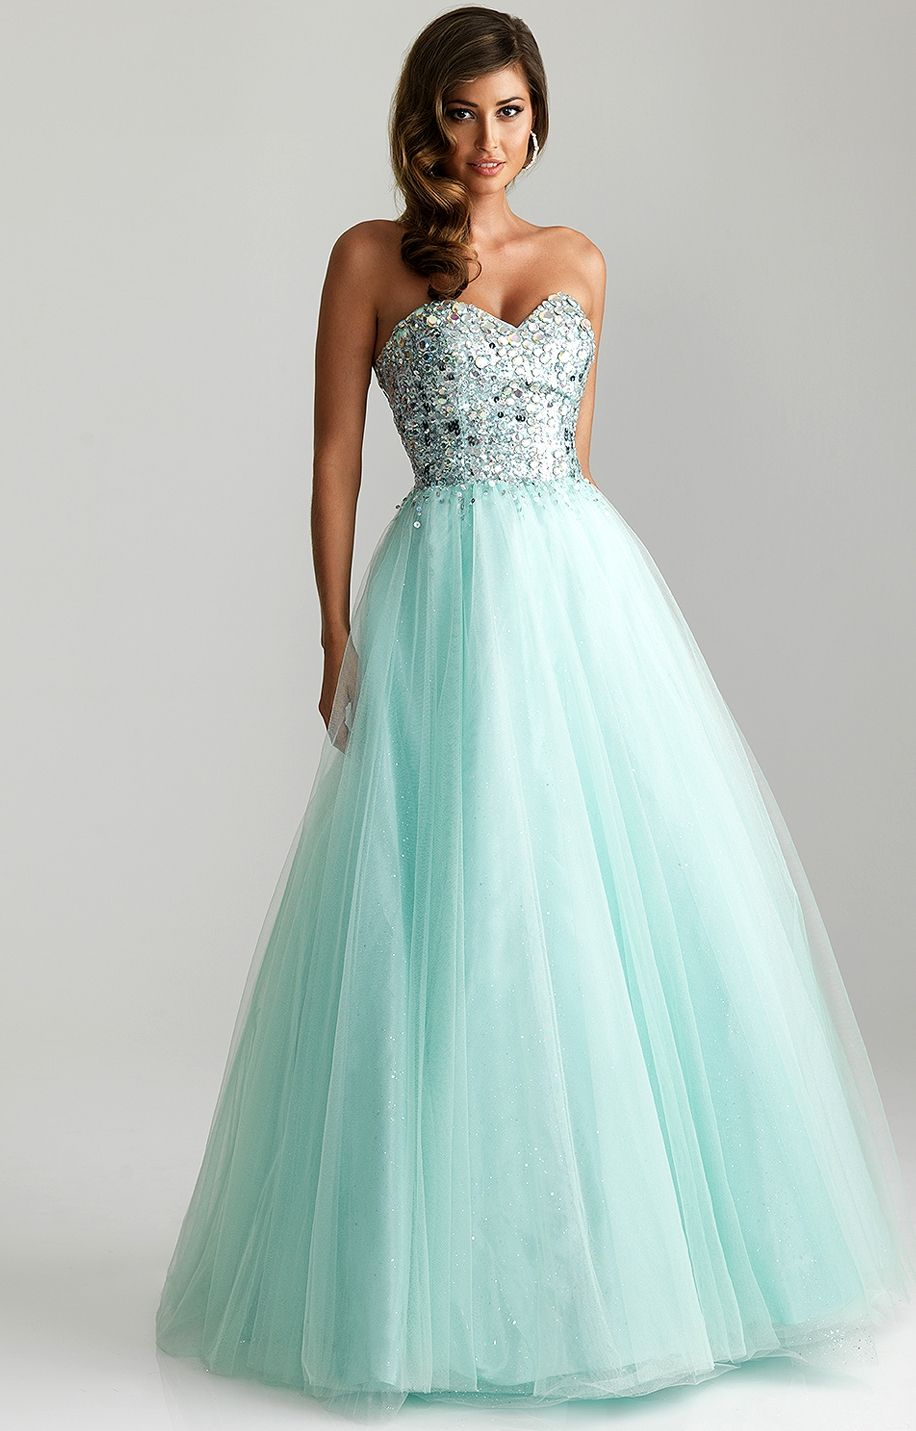 Teal Ballgown Princess Prom Dresses Cute Prom Dresses Prom Dresses Blue [ 1431 x 916 Pixel ]